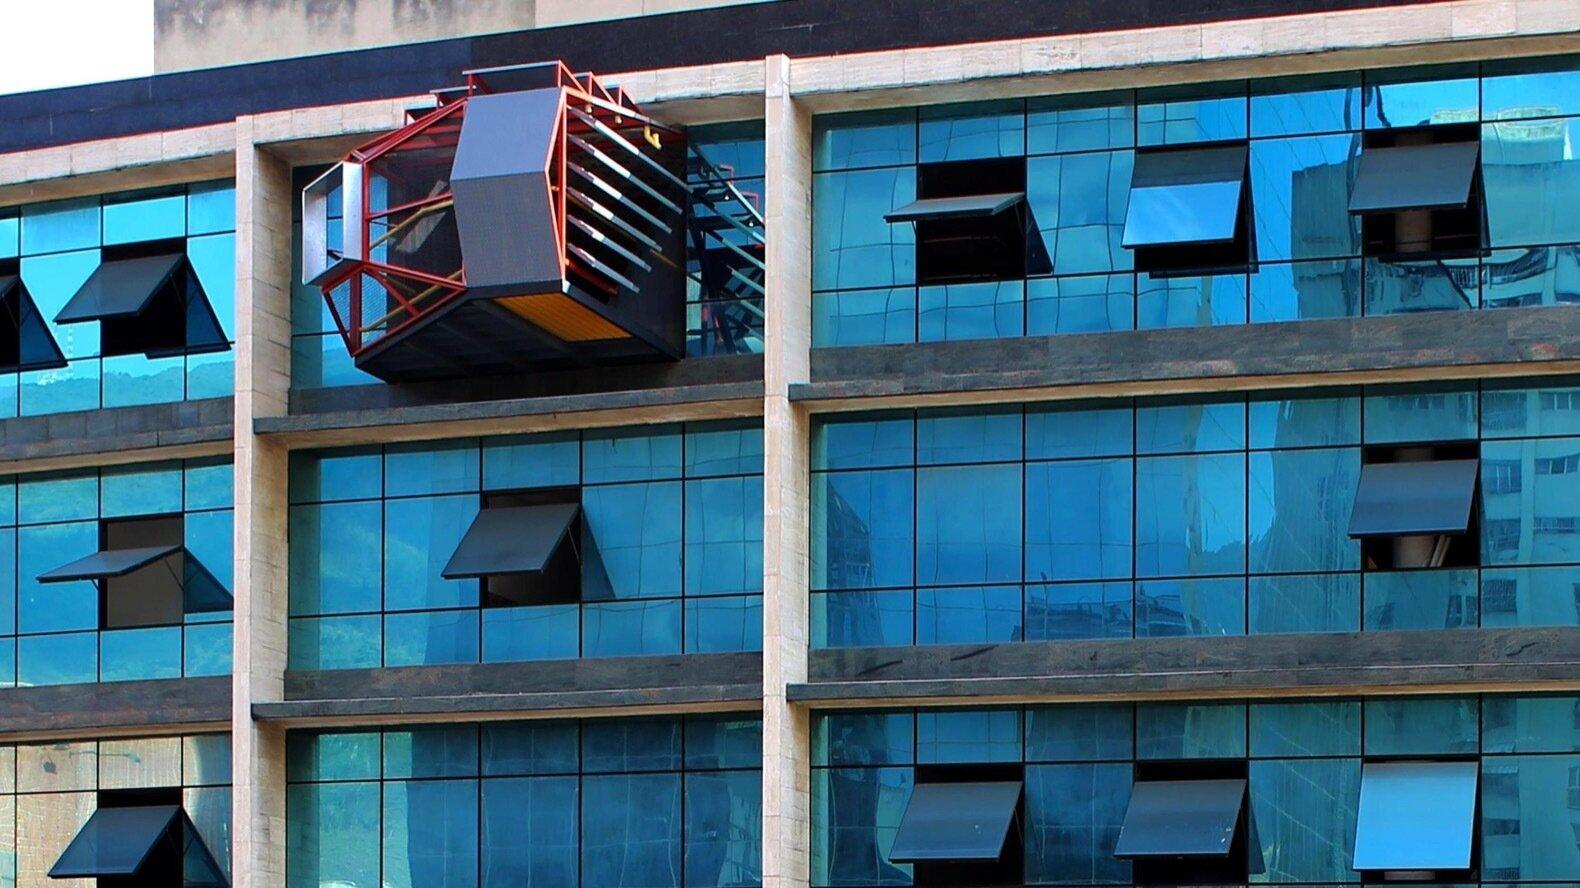 Parasite Balcony by PICO Colectivo